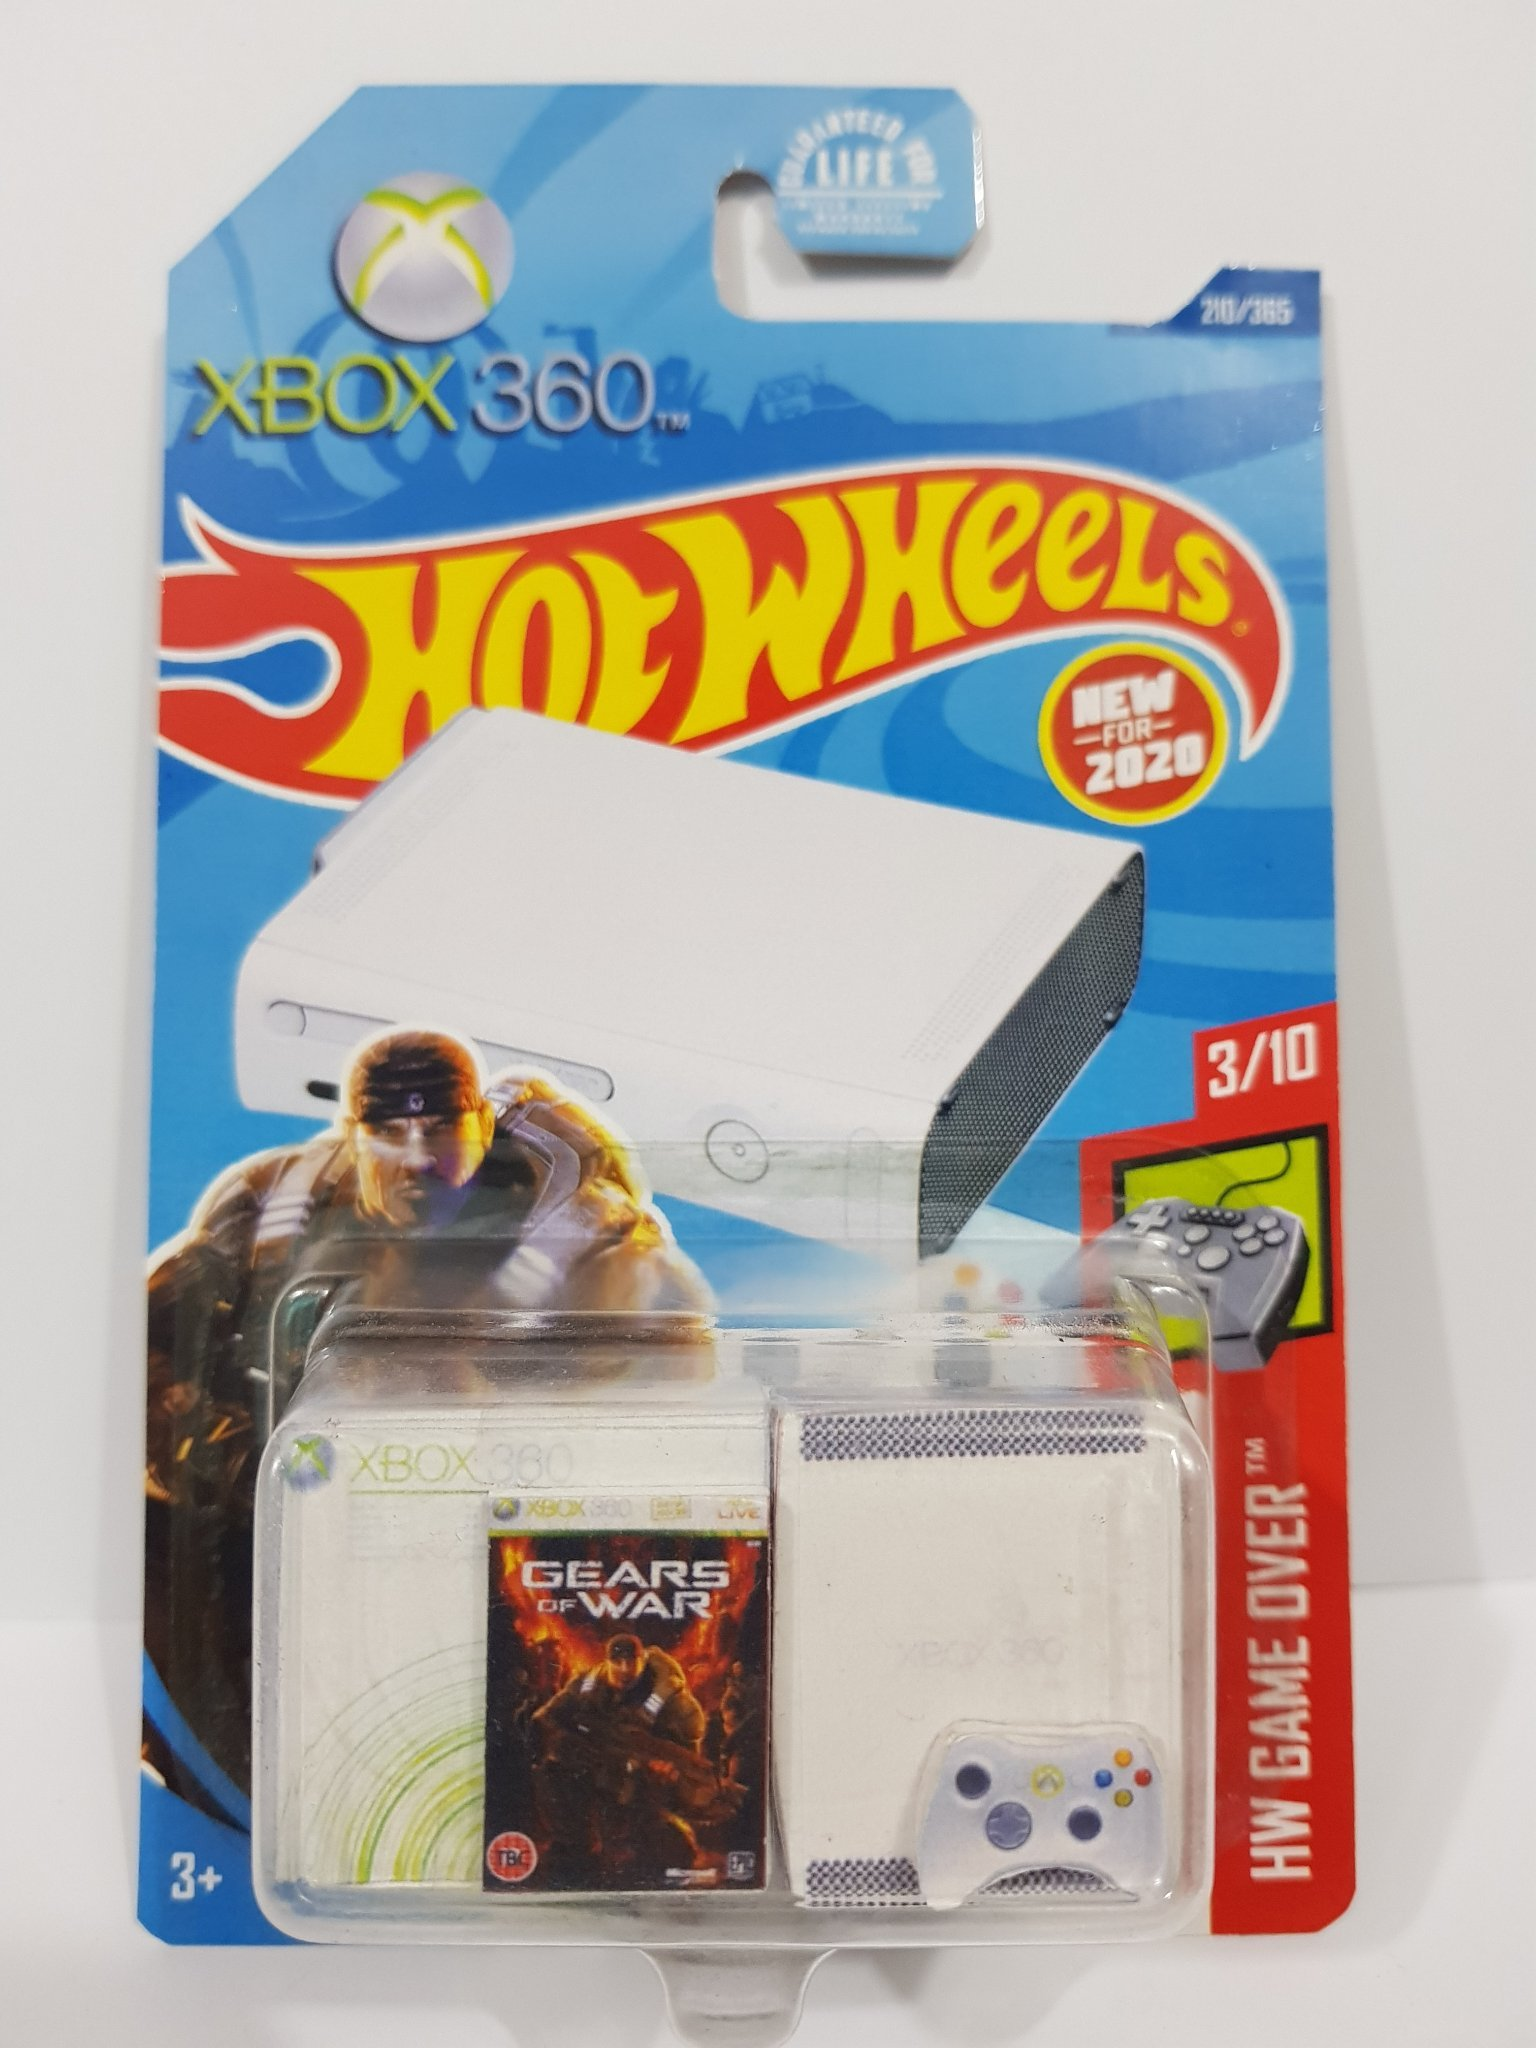 Xbox 360 hotwheels - meme